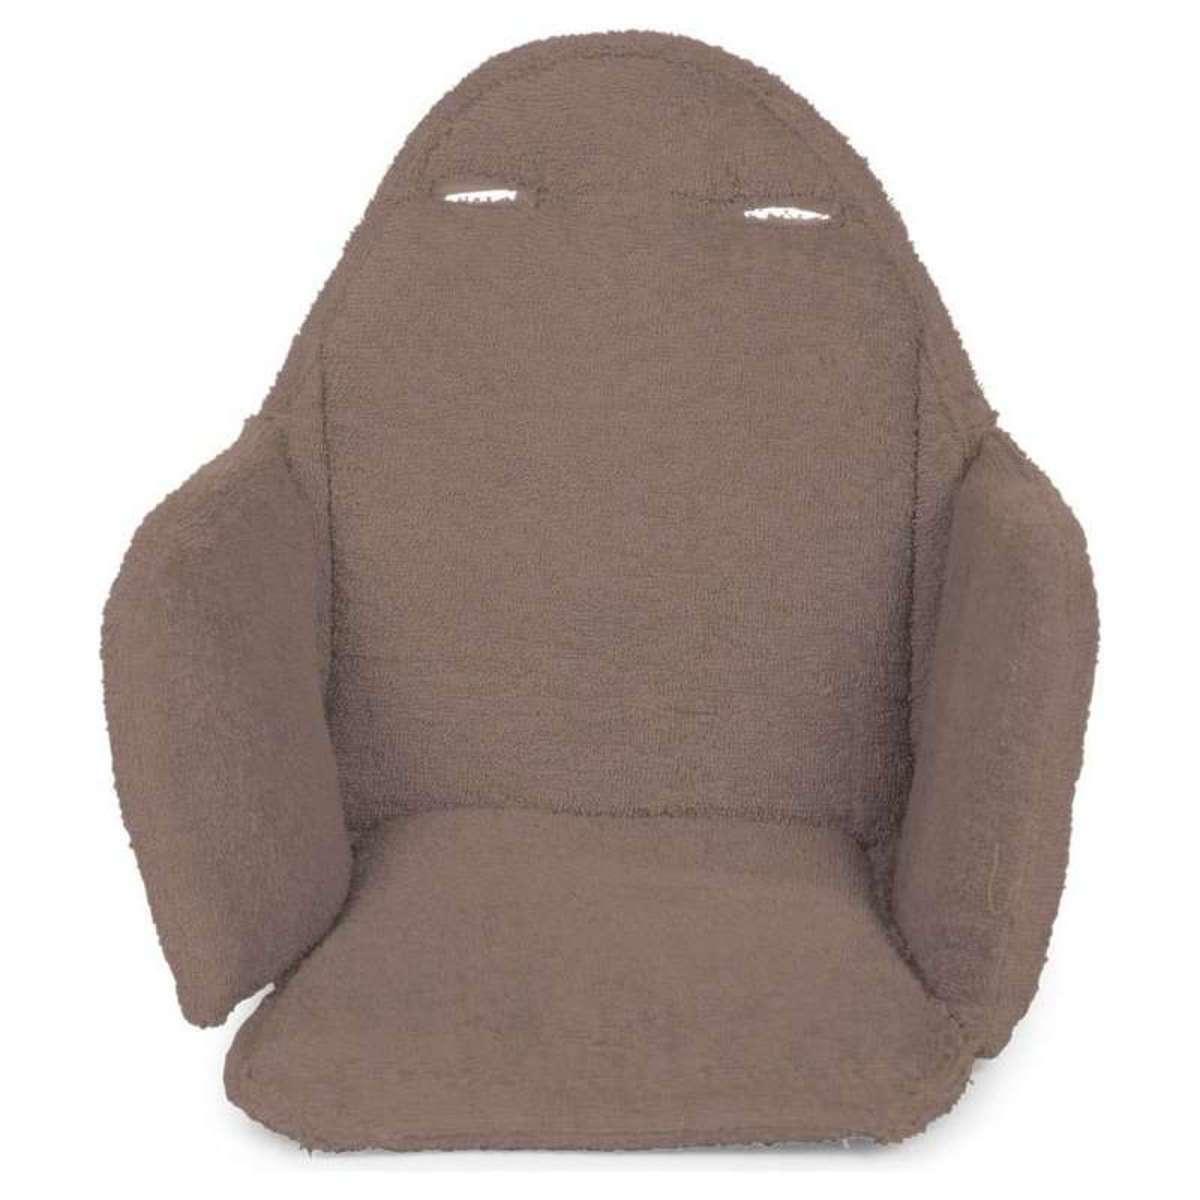 Childwood Coussin Pour Chaise Haute Evolu 2 Warm Grey